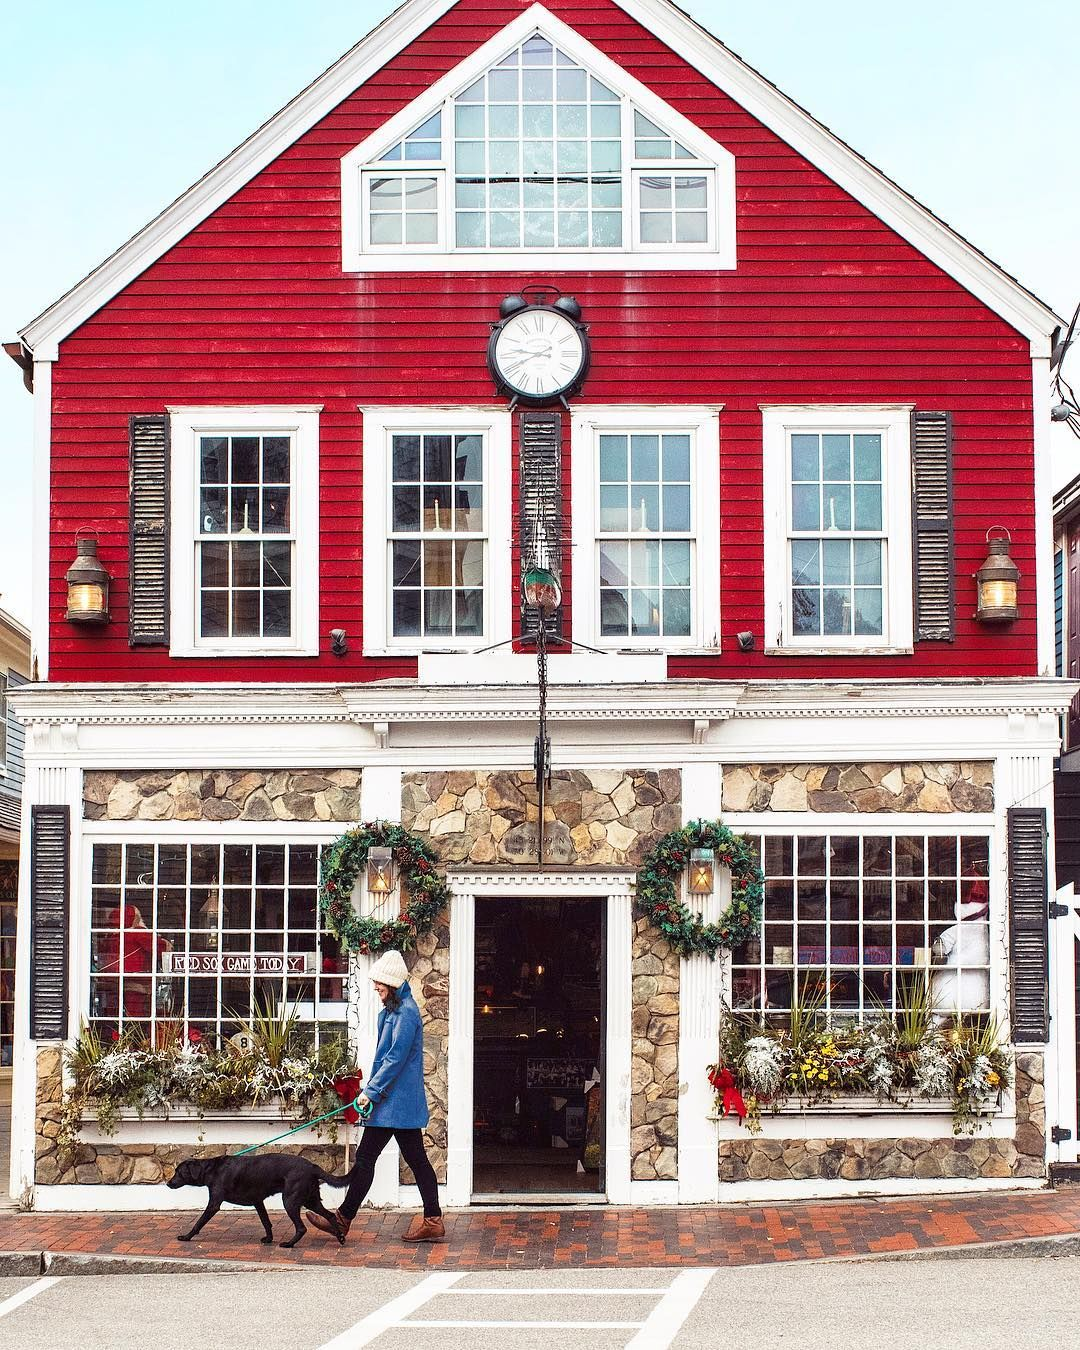 Kennebunkport Christmas Prelude 2019.Paul J Havel Stop Motion On Instagram Christmas Prelude